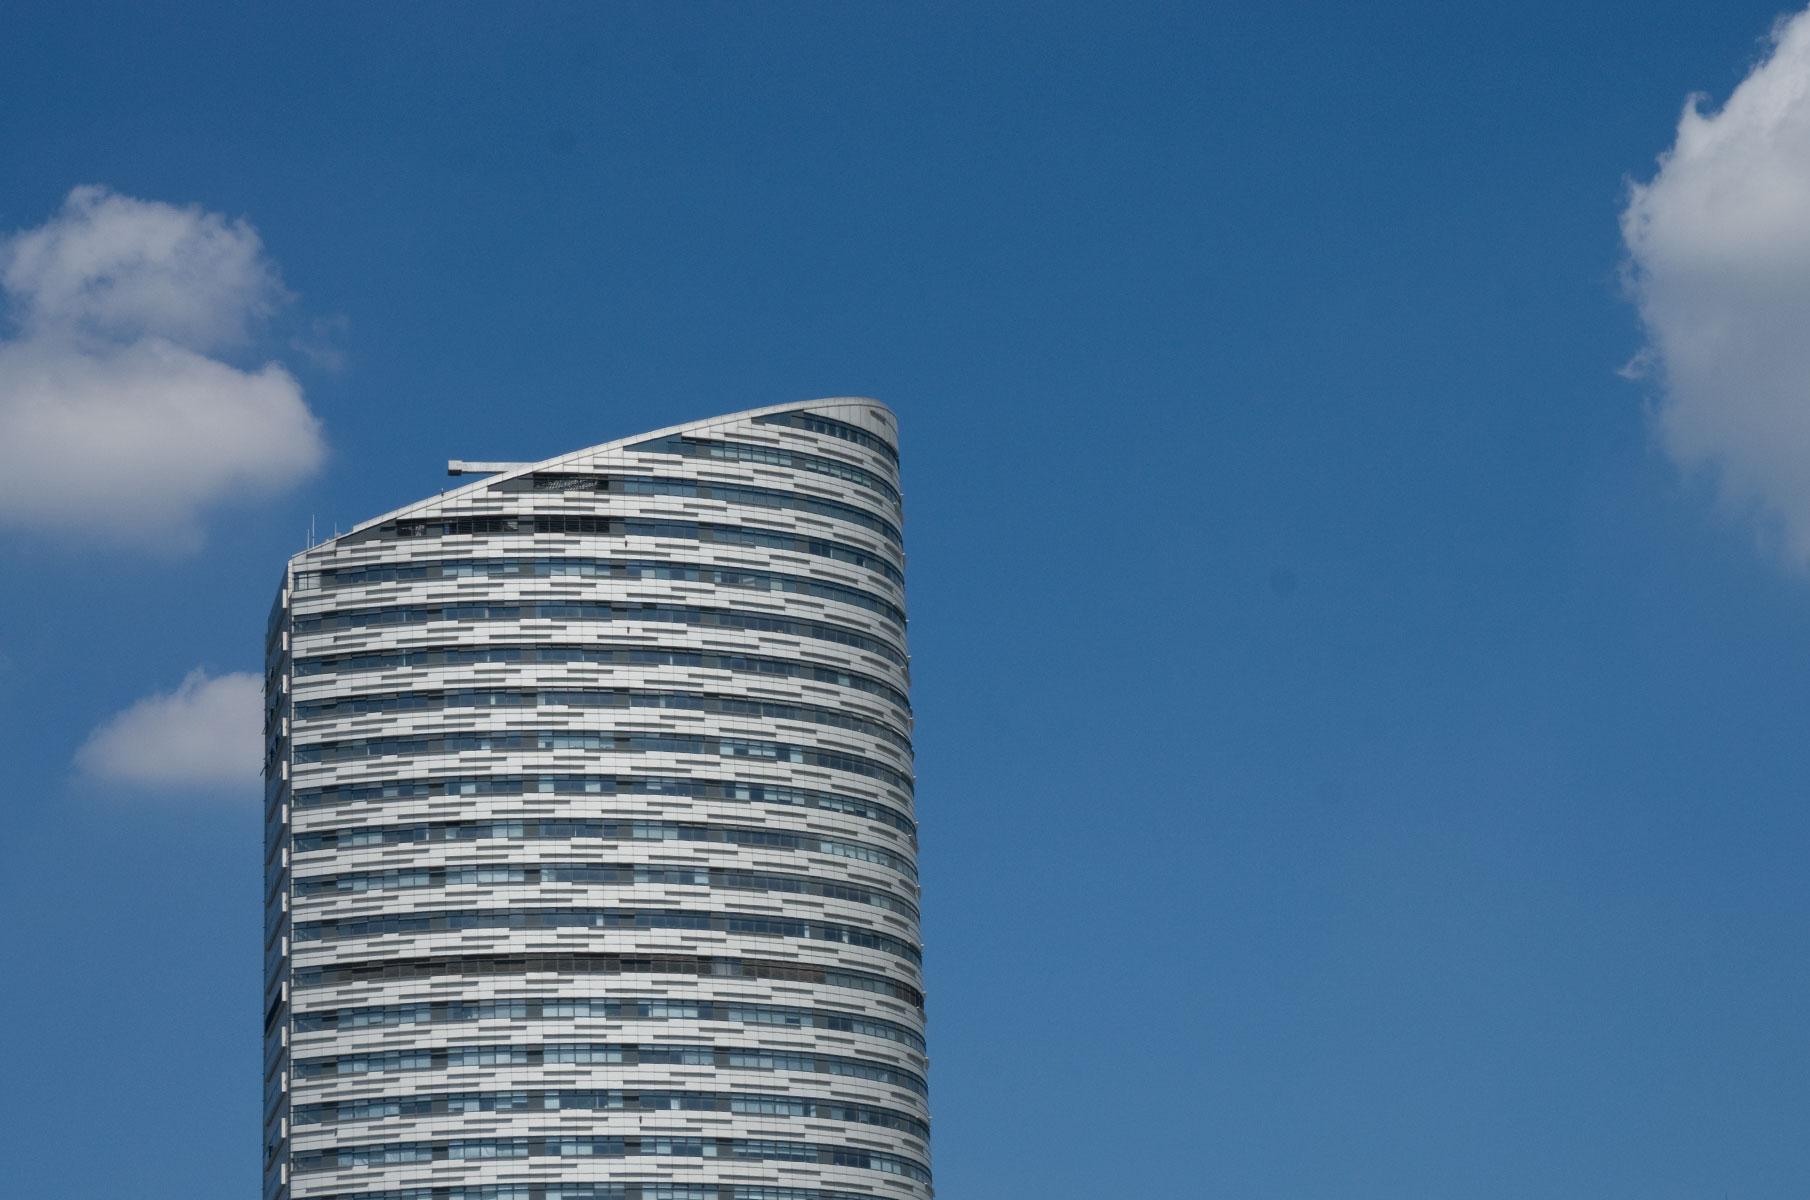 Hochhaus am Tag mit blauem Himmel in Shanghai, China